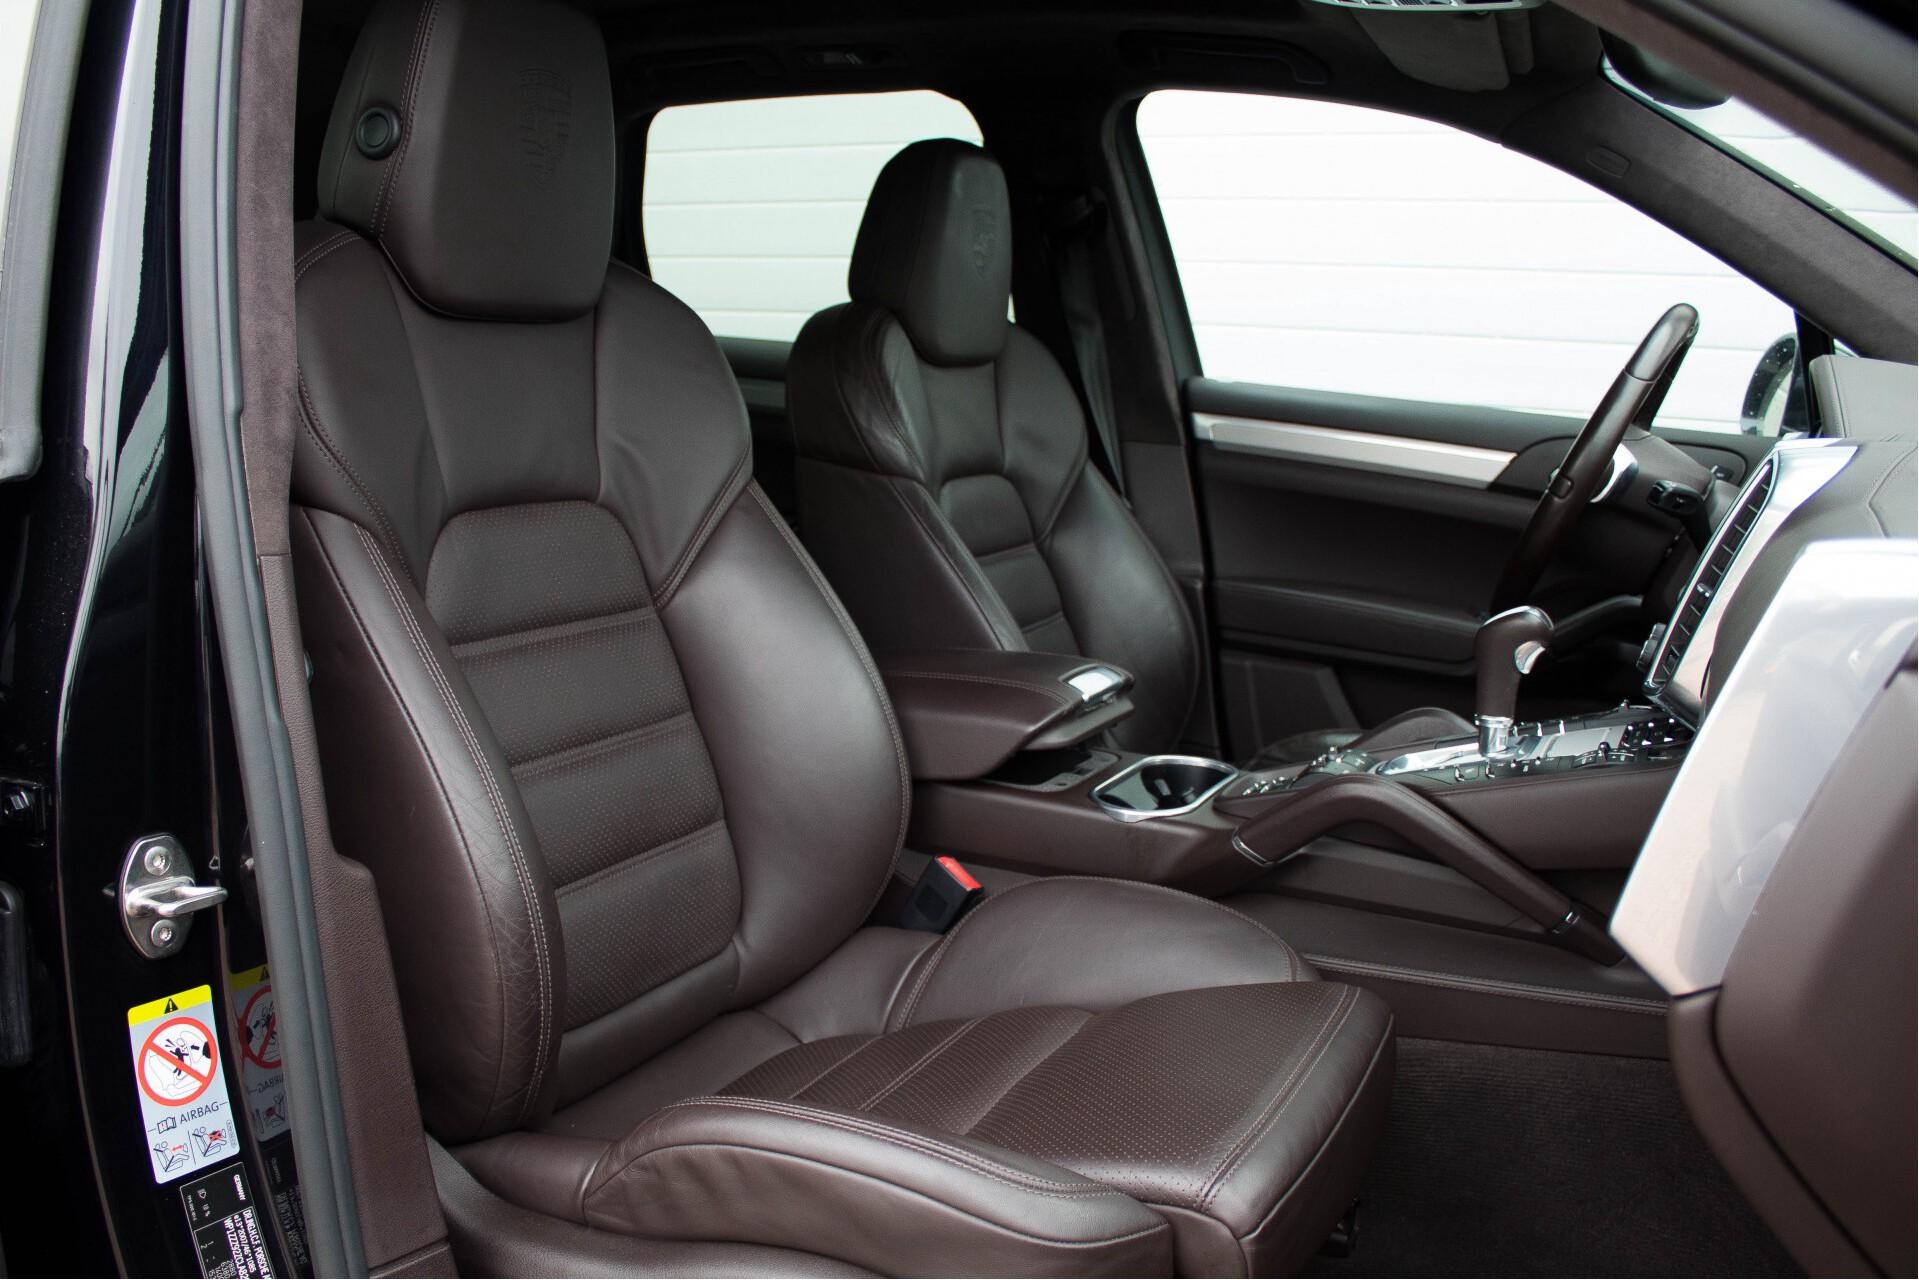 Porsche Cayenne 4.8 Turbo Exclusive/Panorama/Bose/21''/Sportstoelen Aut8 Foto 3